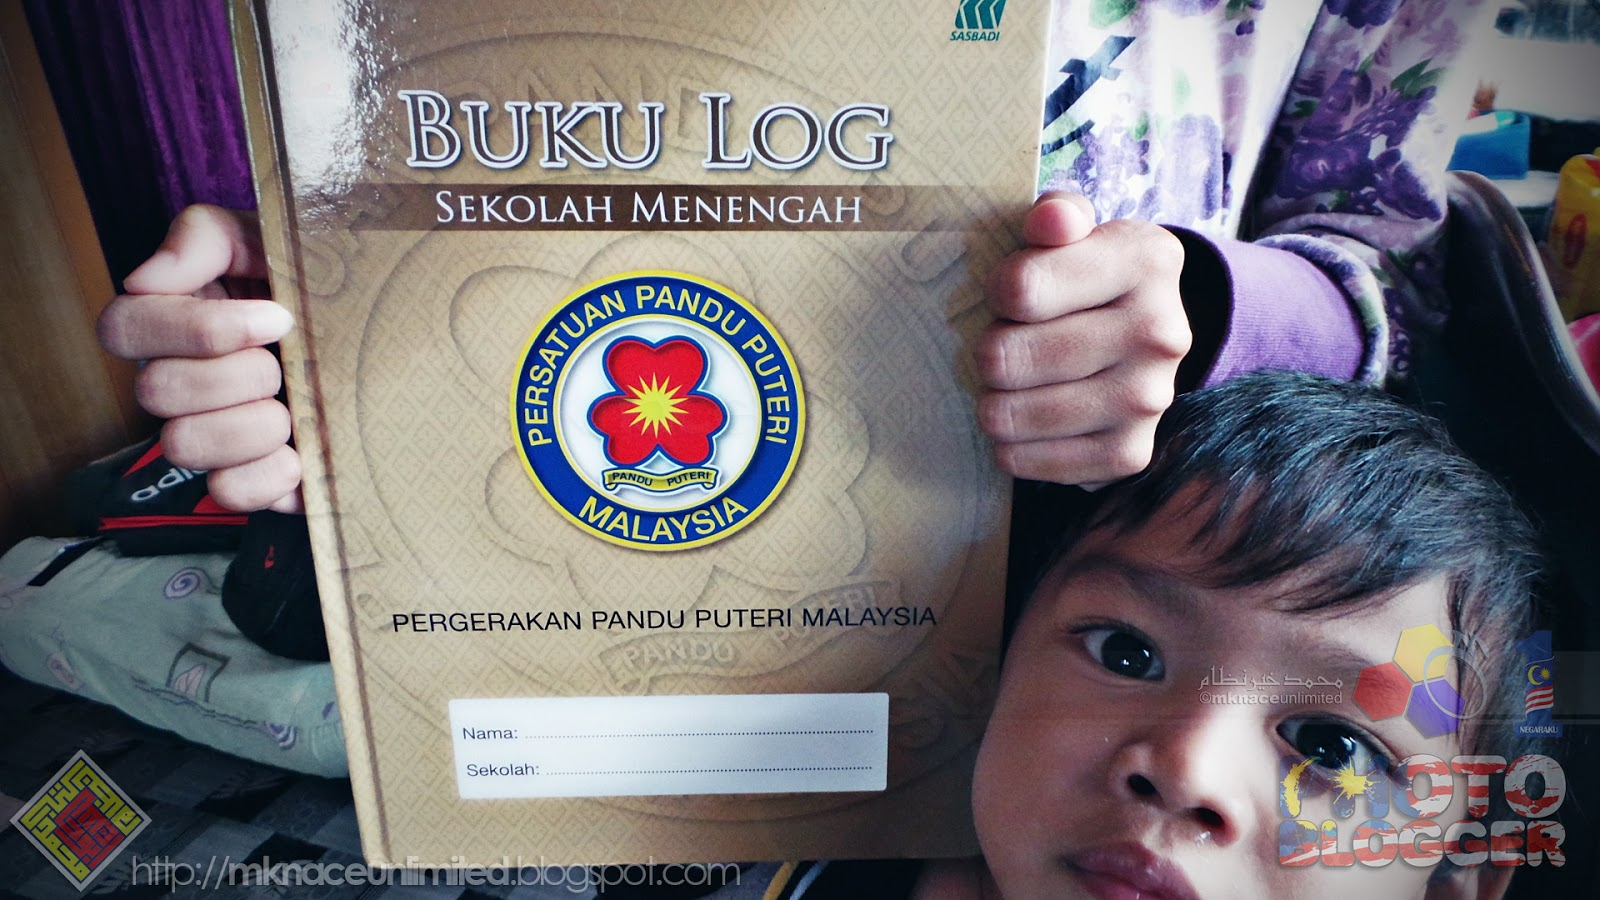 Pergerakan Pandu Puteri Malaysia Buku Log Sekolah Menengah Tcash Vaganza 32 Milo Activ Go Aku Gerak Aje Ke Lata Sri Pulai Tetiba Henpon Berdering Bang